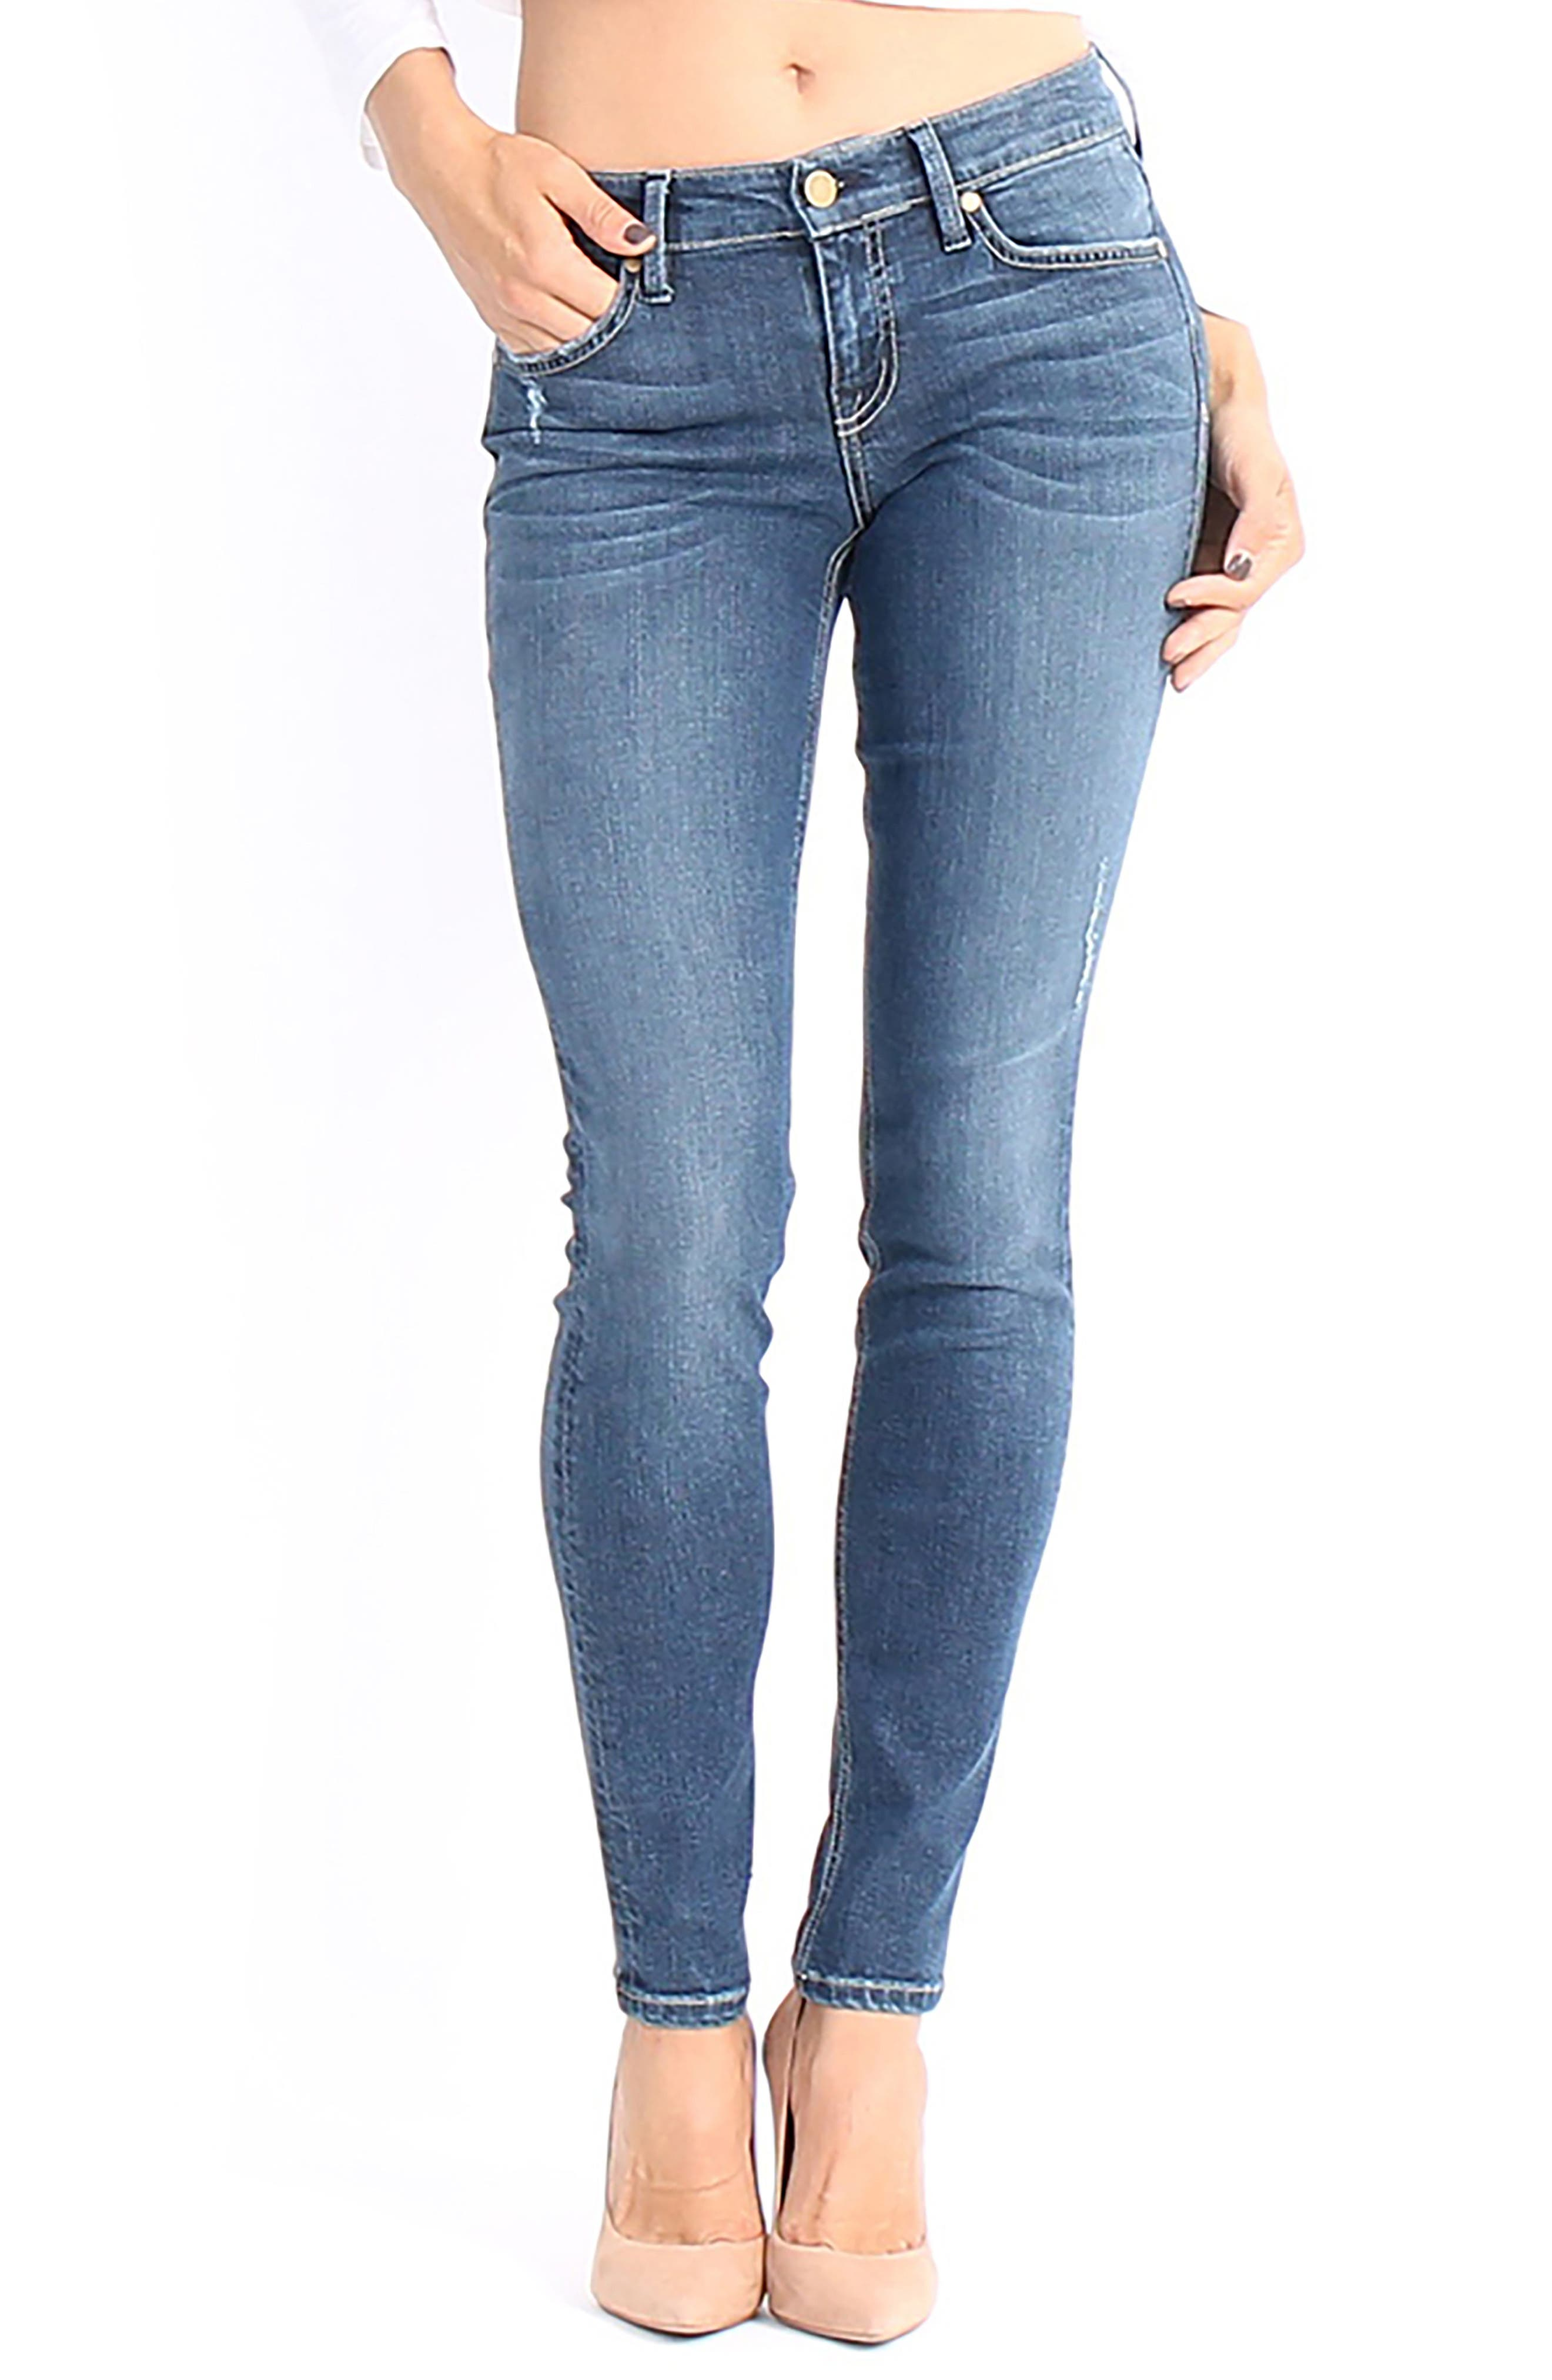 Level 99 Lisa Stretch Distressed Super Skinny Jeans